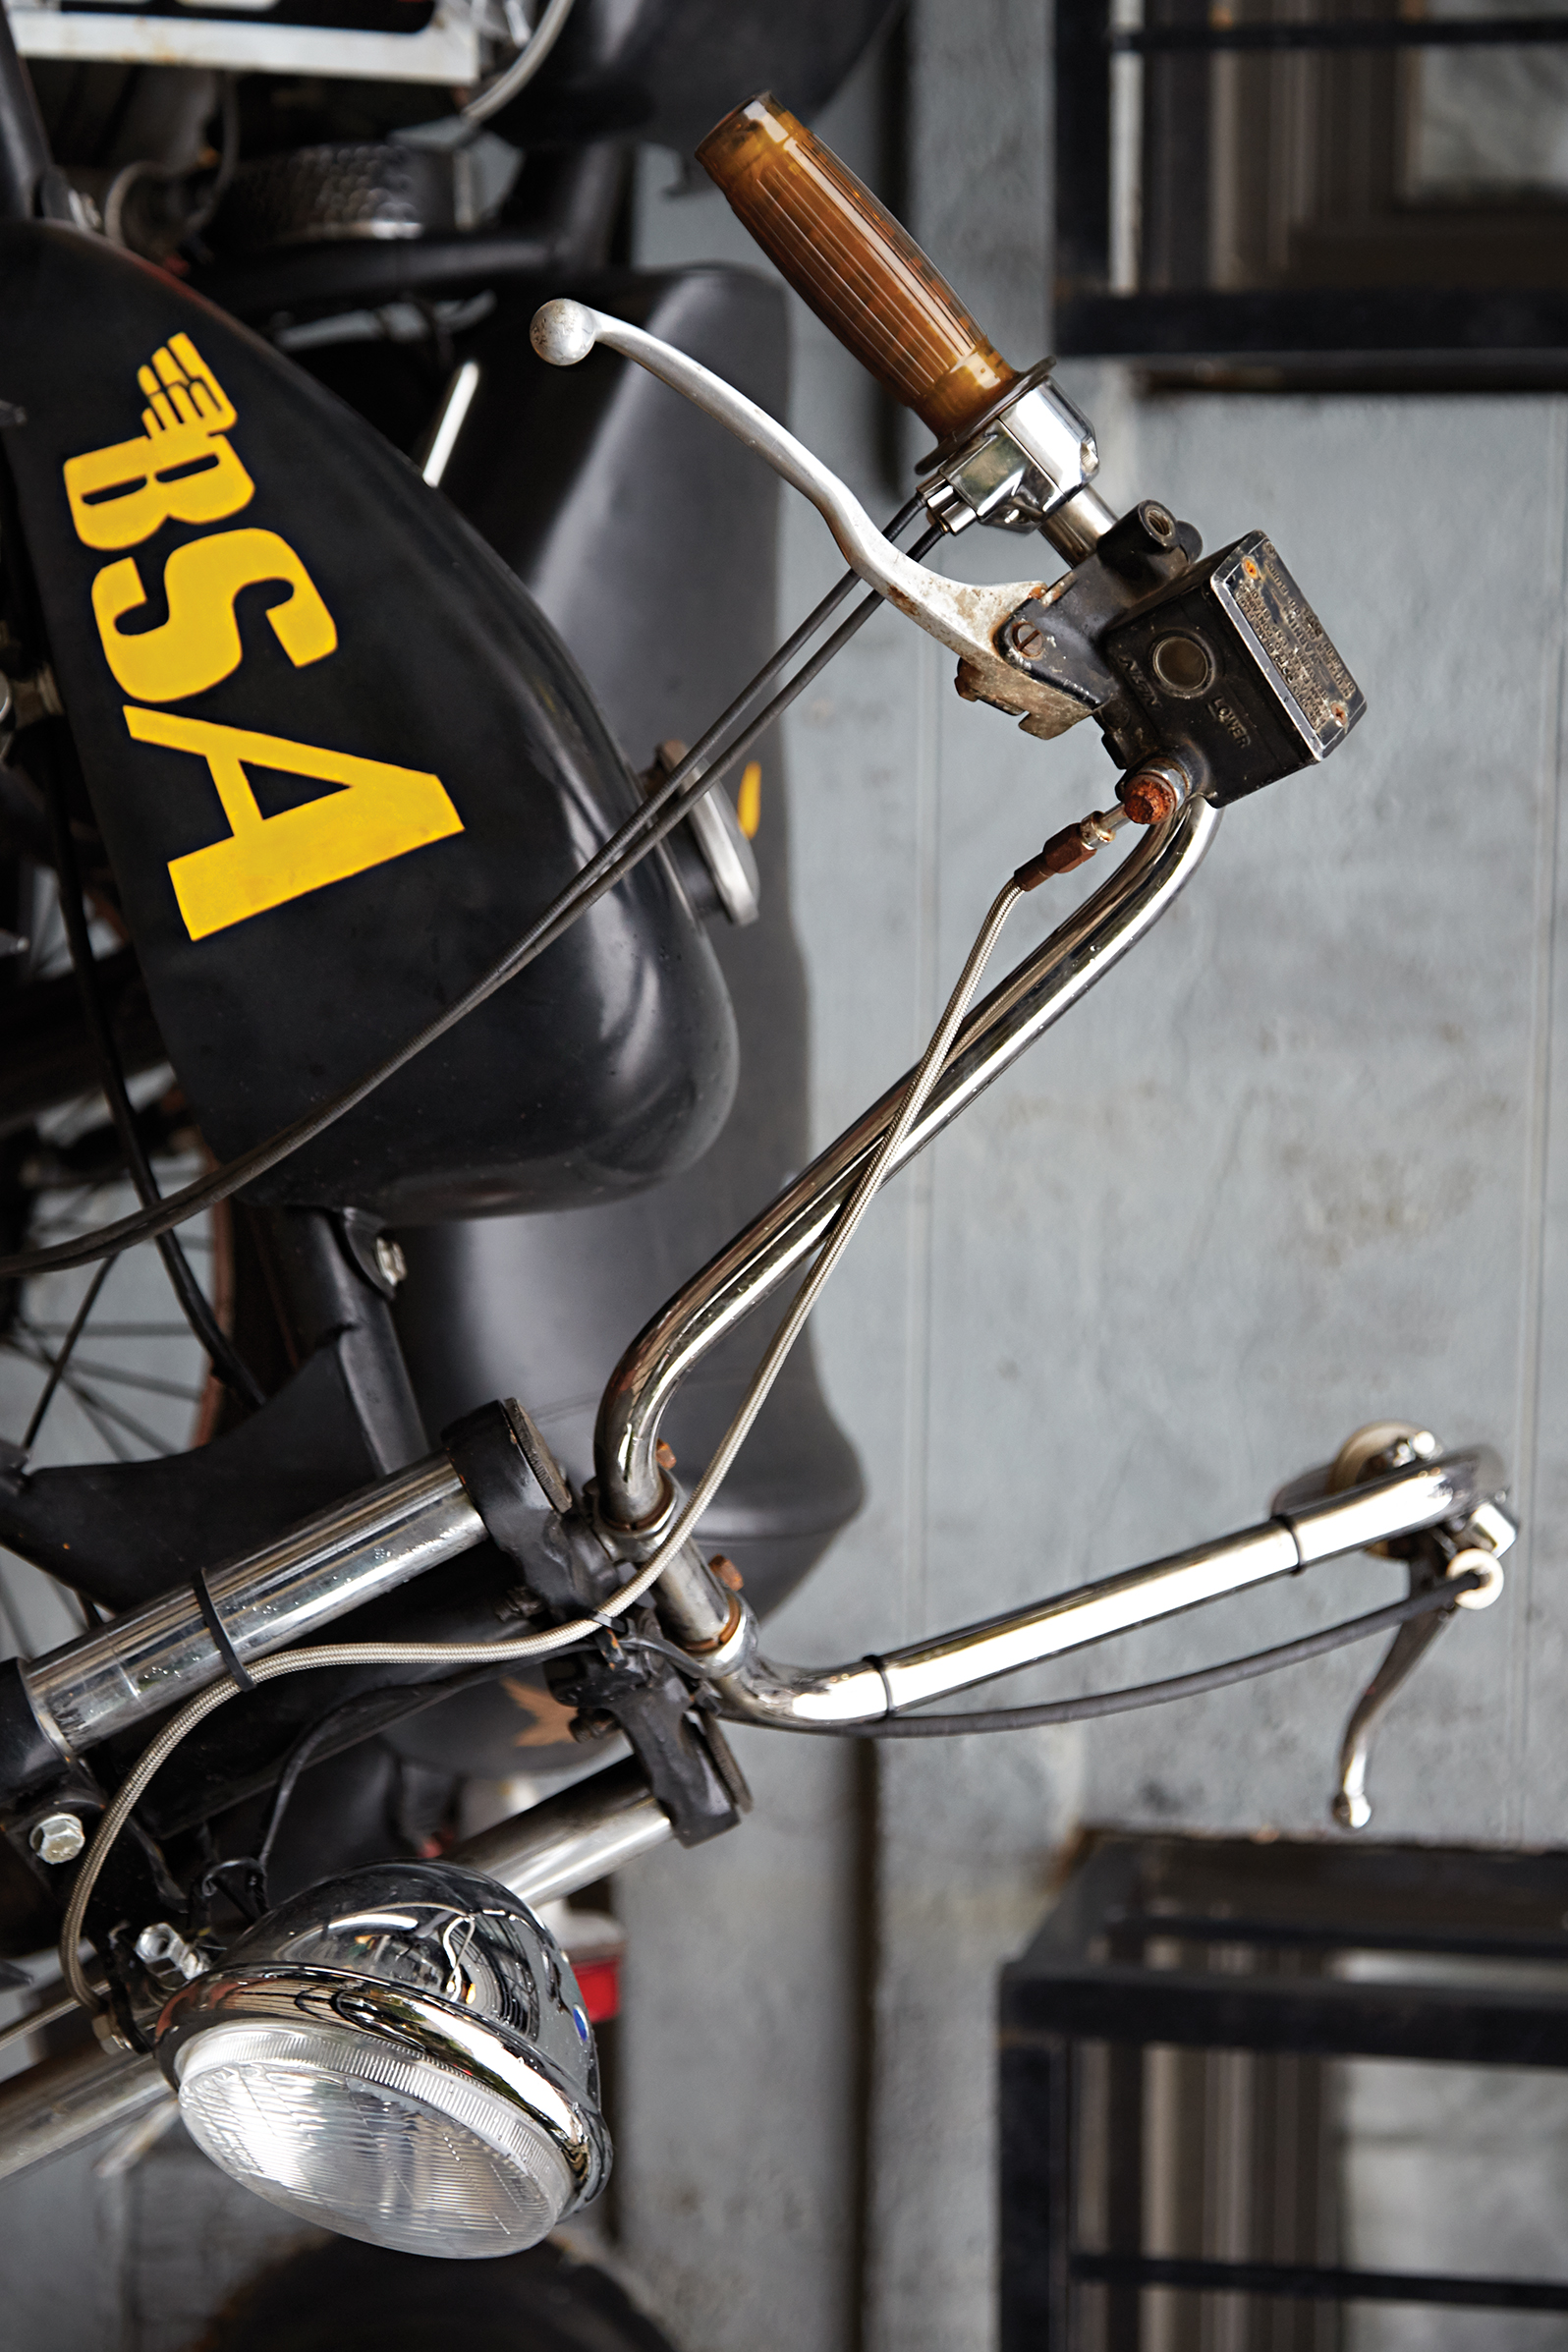 The Kids R 15 Bike still CYMK.jpg